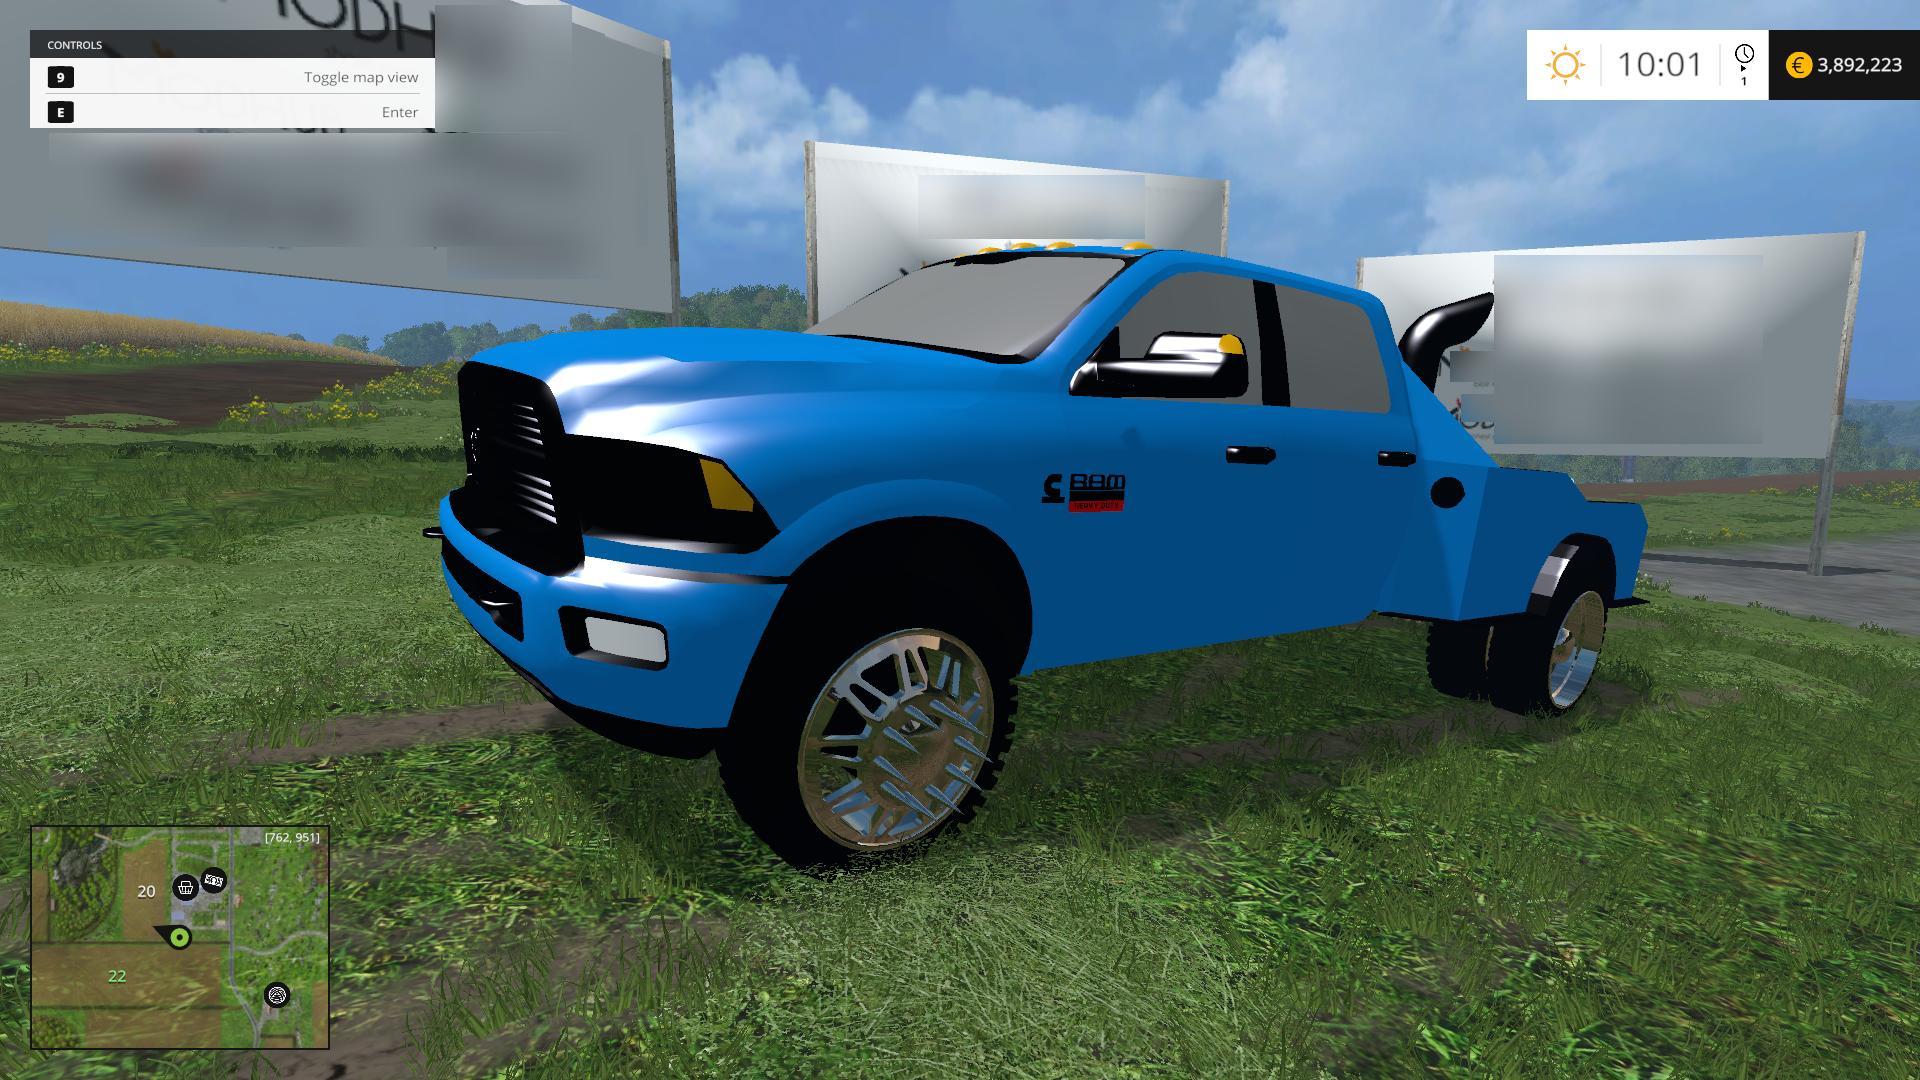 Dodge Ram 3500 Hauler Gamesmods Net Fs19 Fs17 Ets 2 Mods